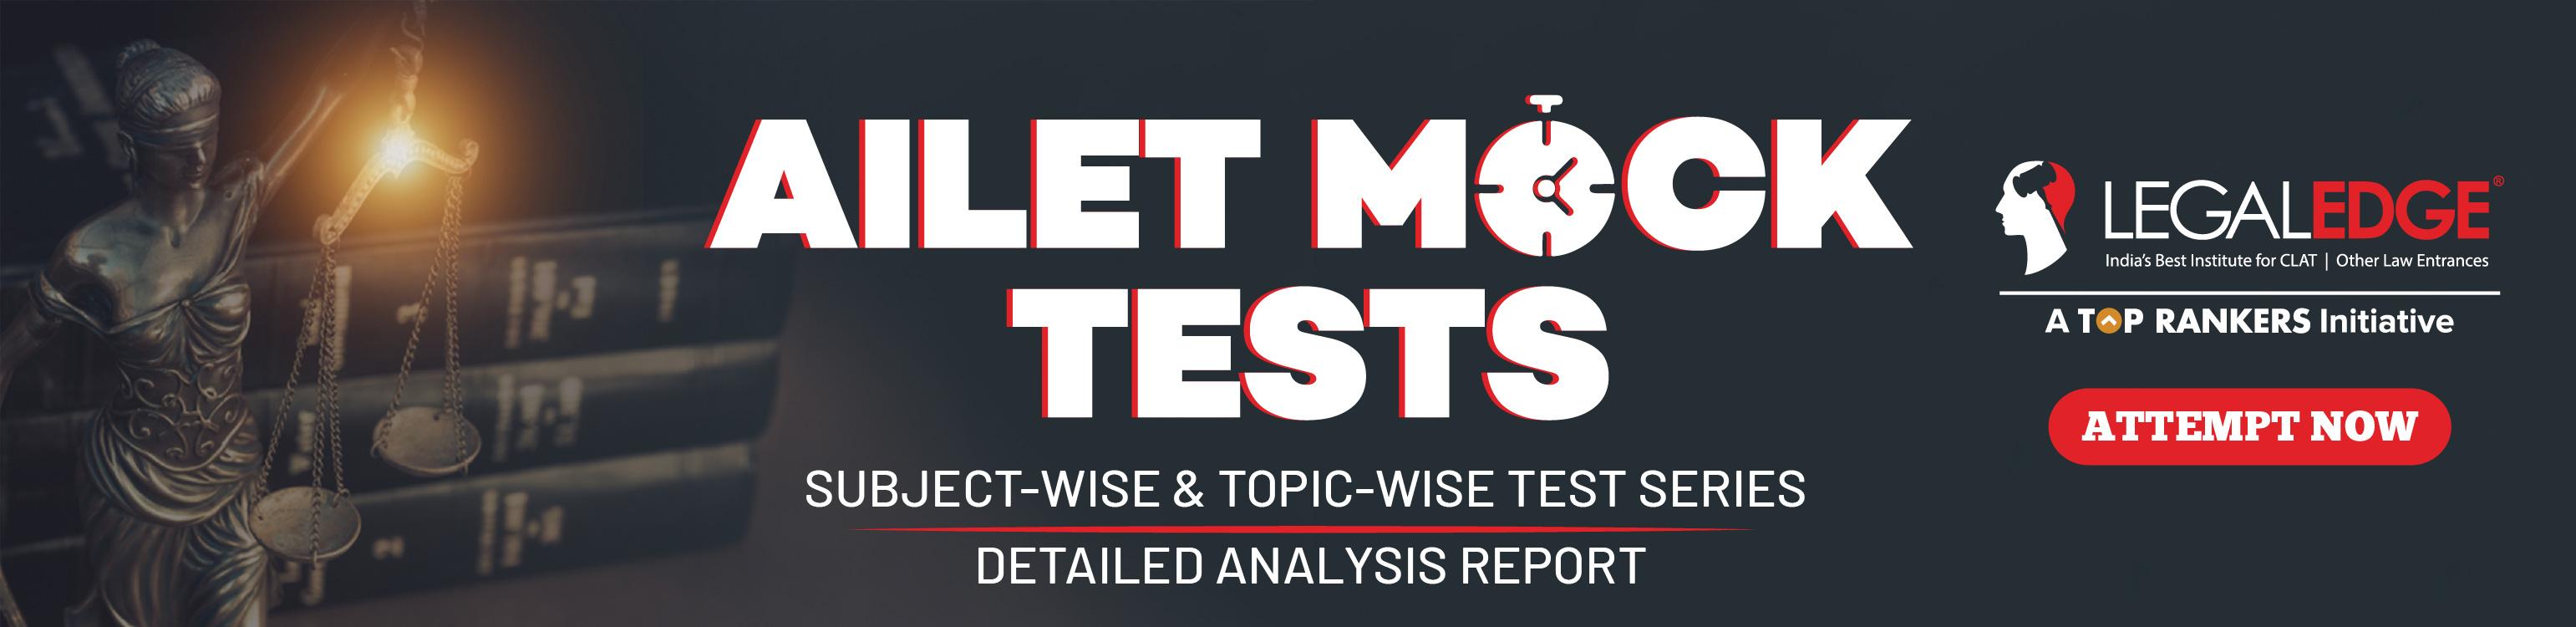 AILET mock test